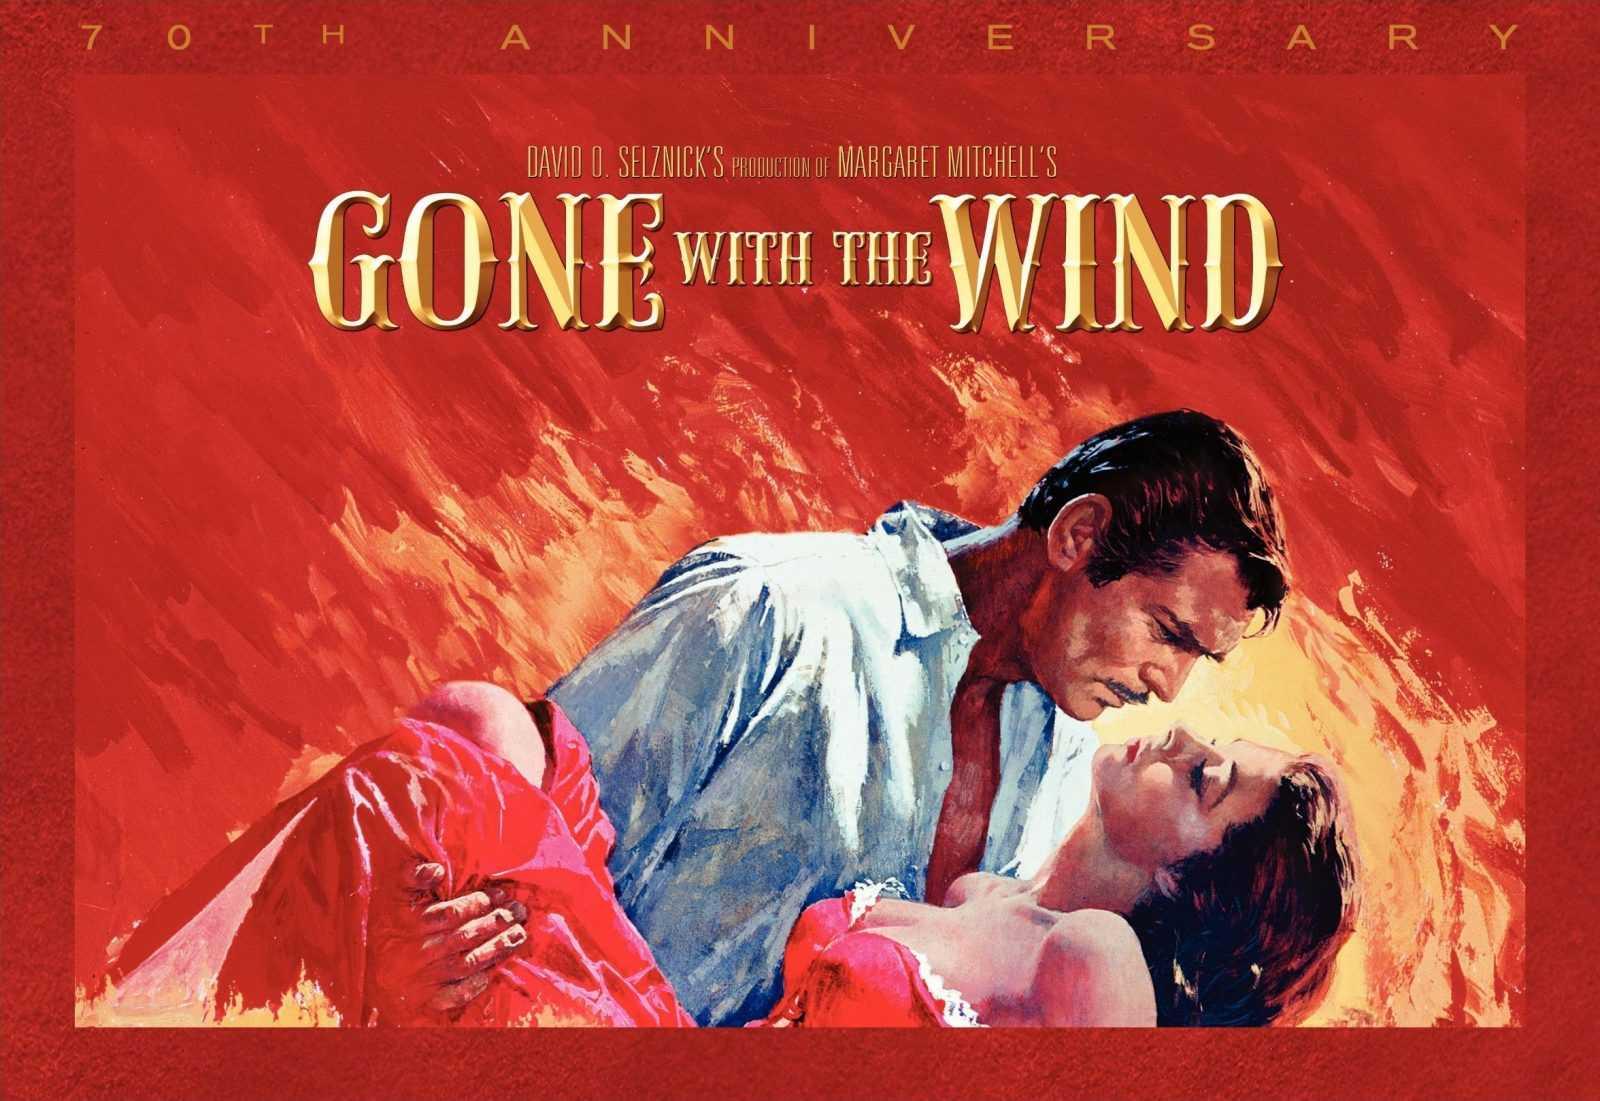 Planter's Punch – Lo que el viento se llevó (Gone with the wind)